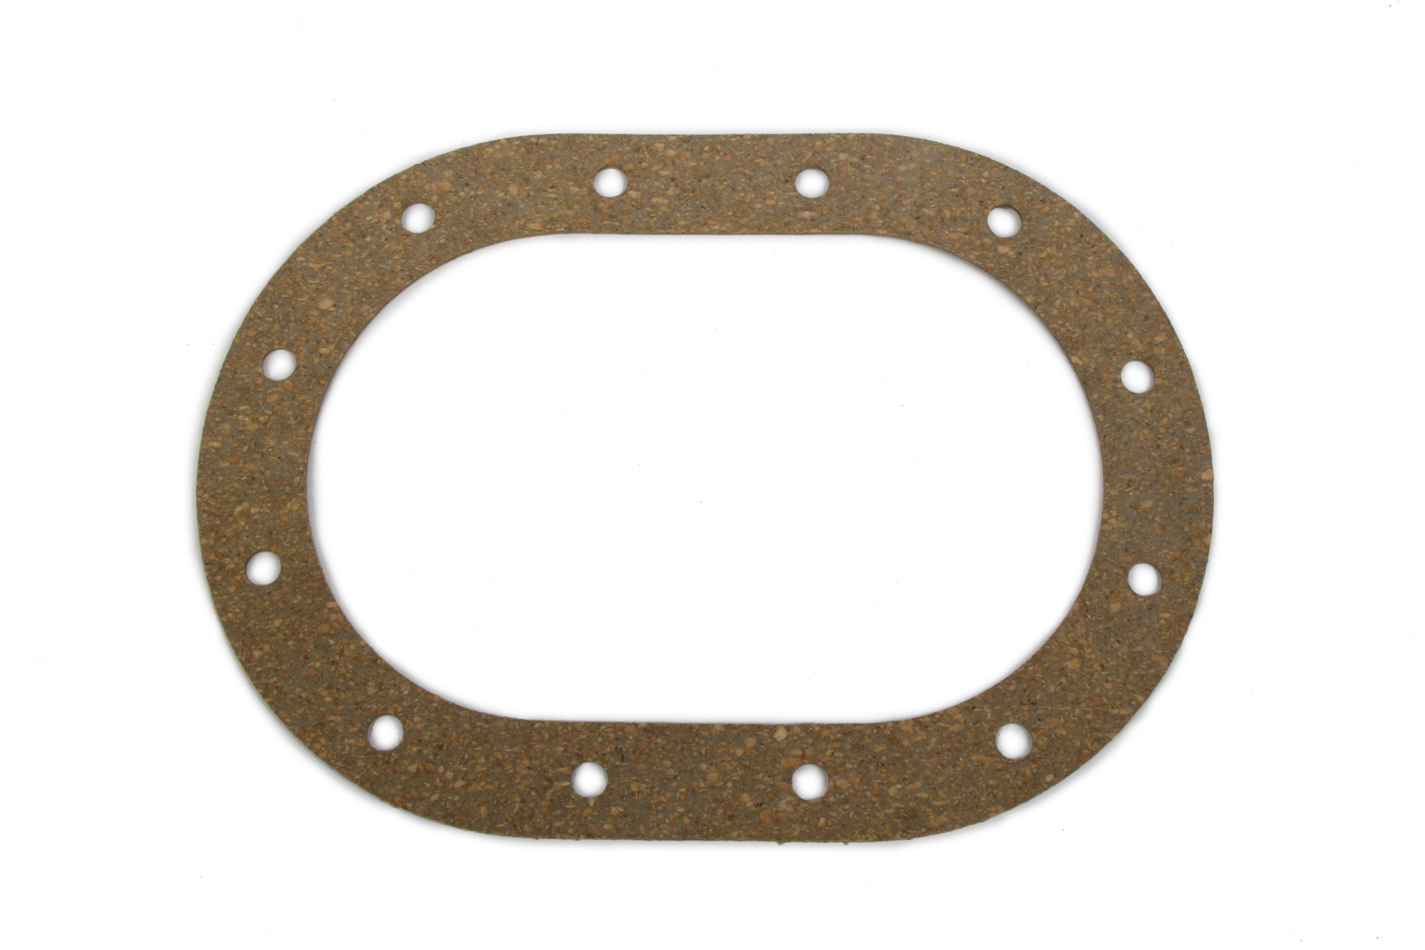 Saldana Top Plate Gasket 4x6 Cork 12 Hole